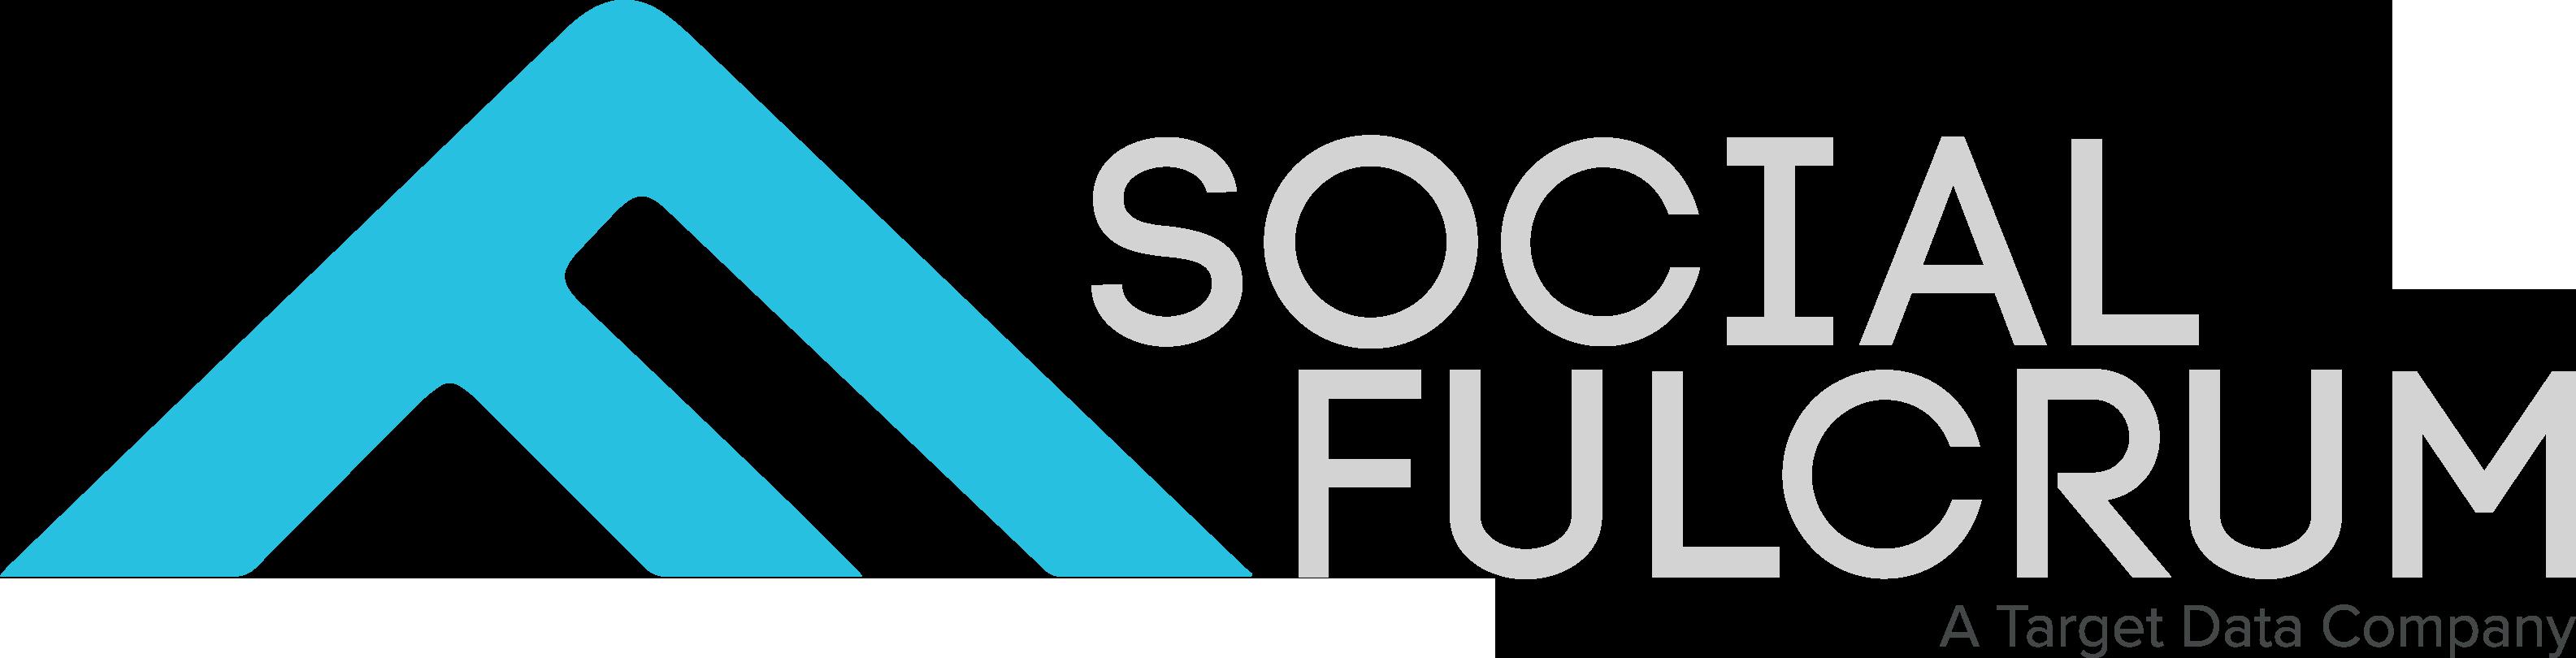 Social Fulcrum Logo